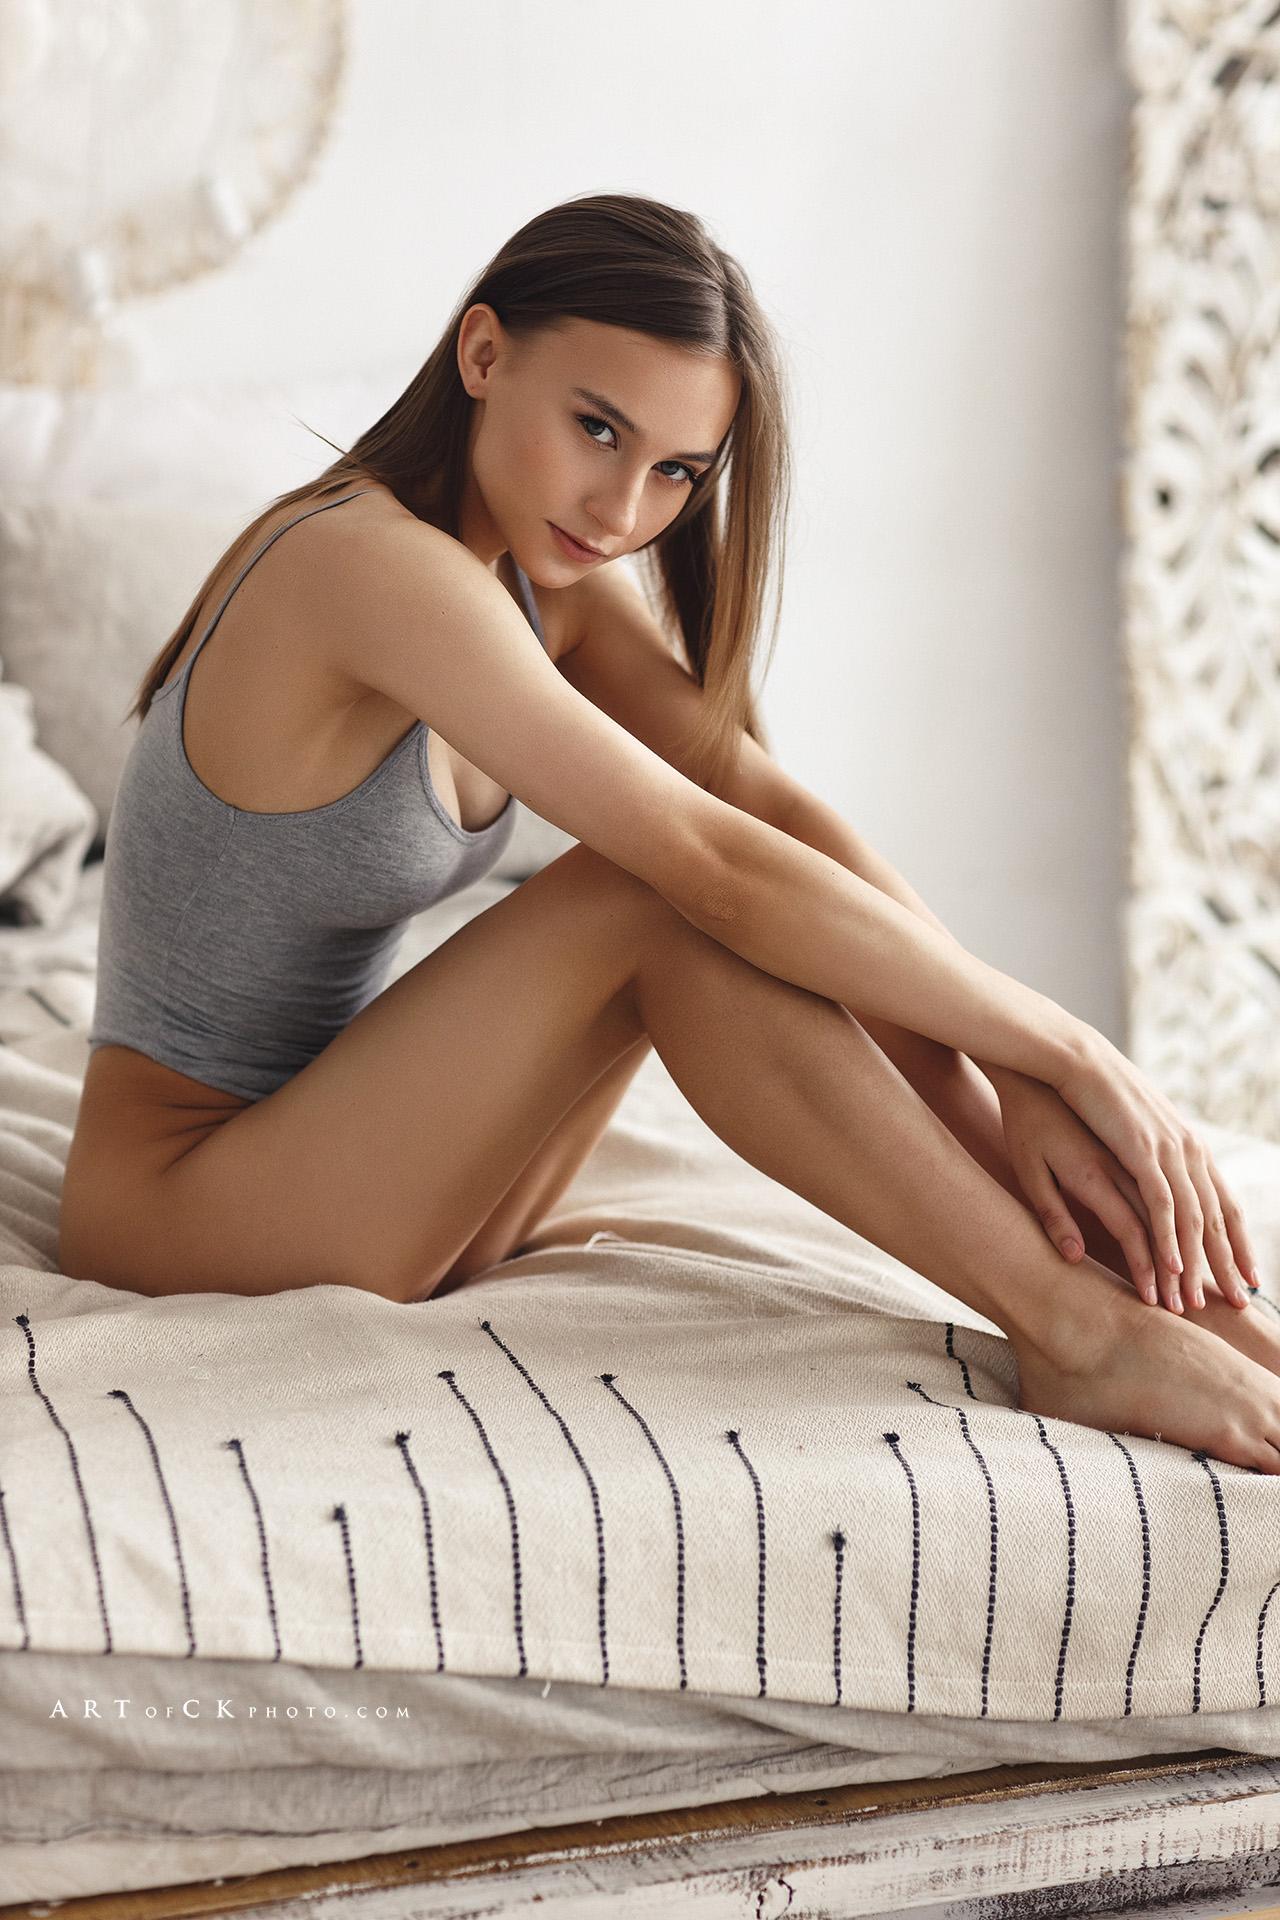 People 1280x1920 Stepan Kvardakov women brunette long hair straight hair looking at viewer bodysuit legs grey clothing in bed bed lingerie bottomless grey tops Ekaterina Ovchukhova